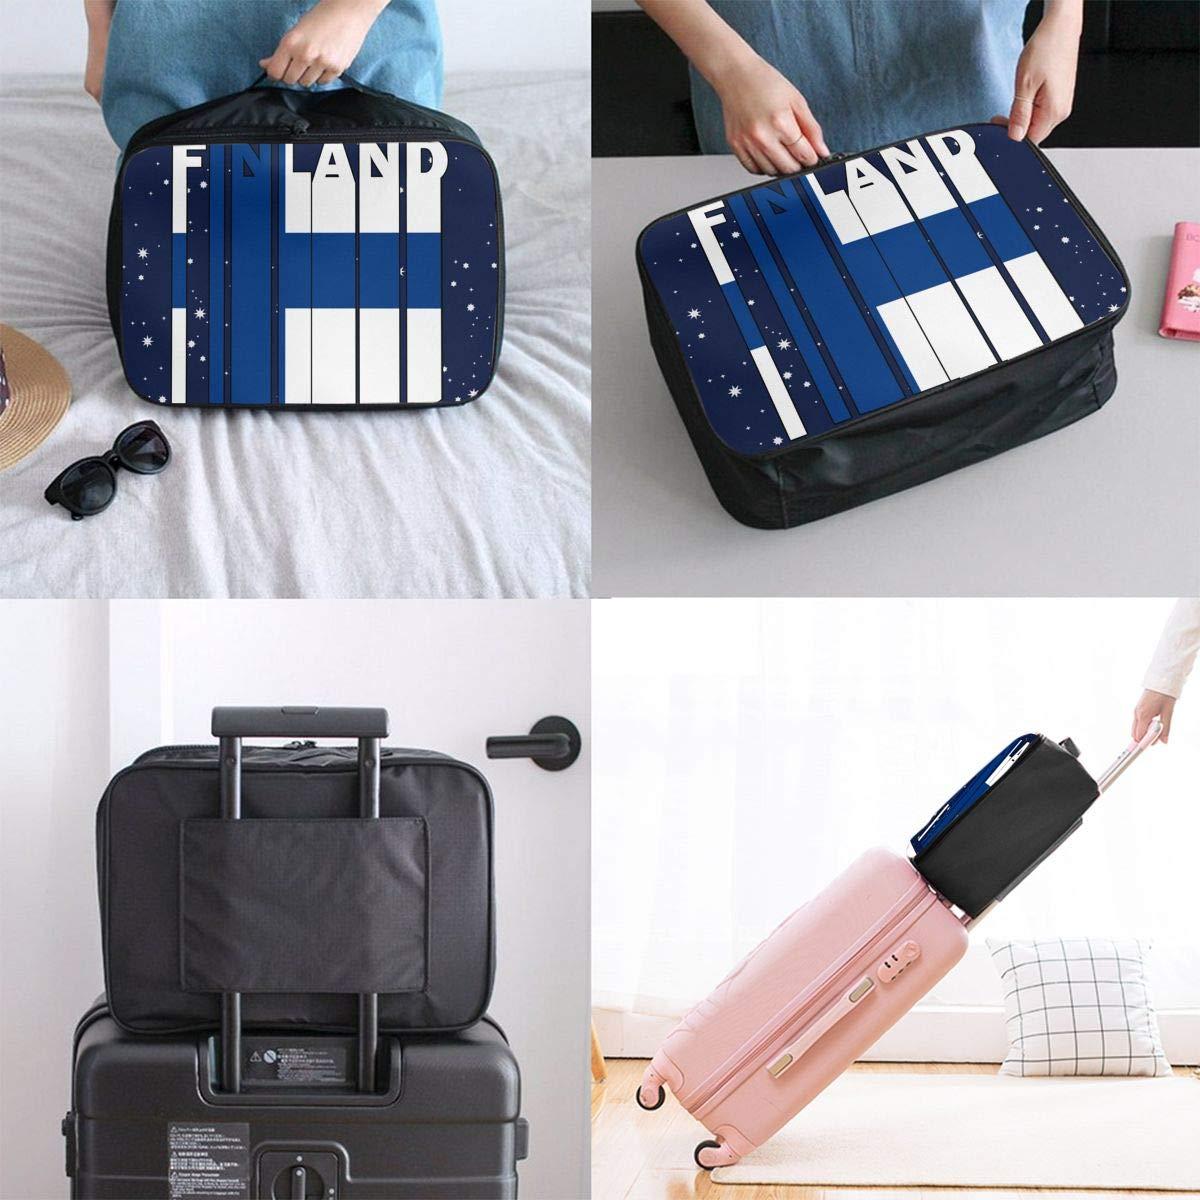 Finland Flag Word Luggage Bag Capacity Portable Large Travel Duffel Bag Makeup Storage